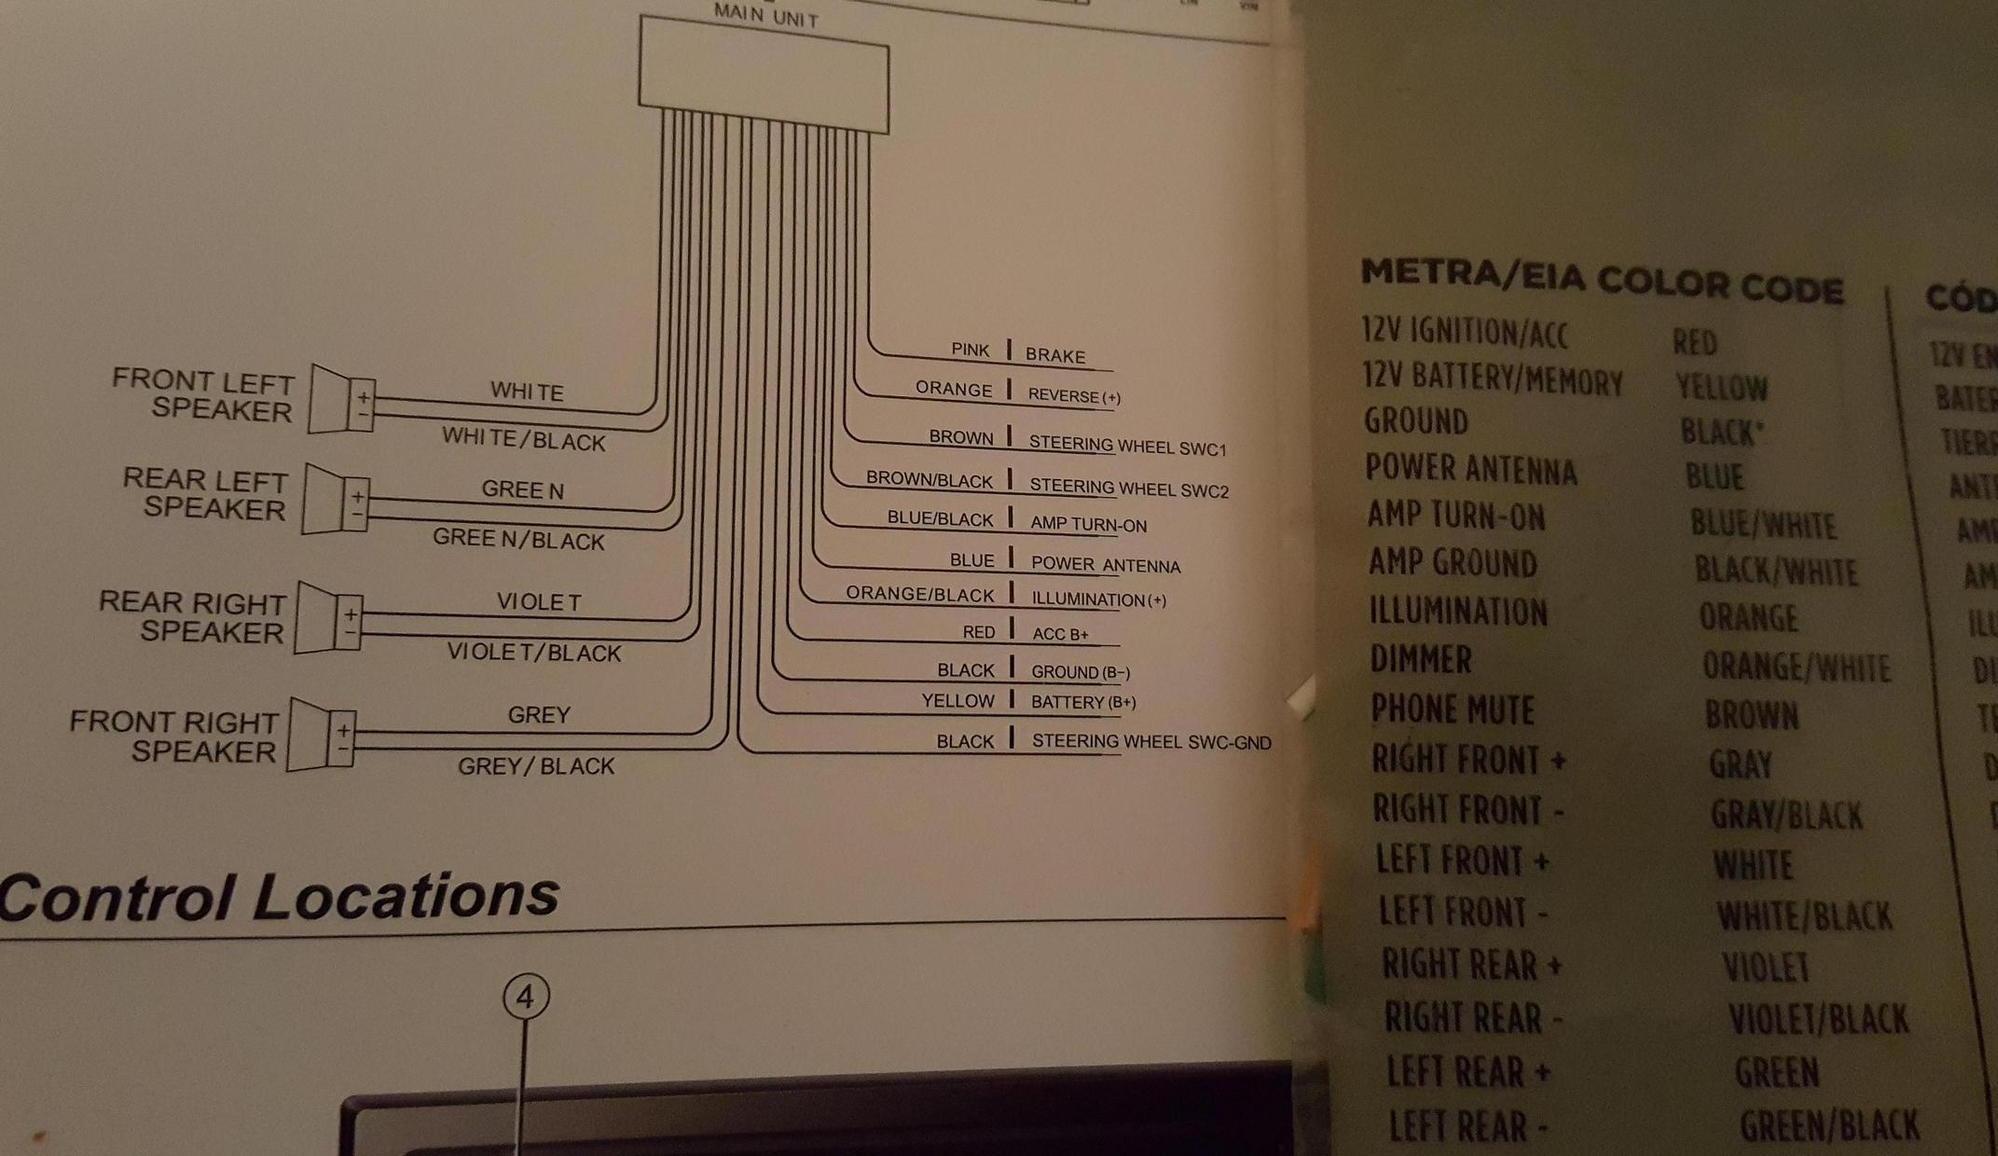 2006 honda element wiring diagram on 2006 images free download on honda element stereo wiring diagram 2001 Honda Civic Radio Wiring 08 Honda Civic Stereo Wiring Diagram